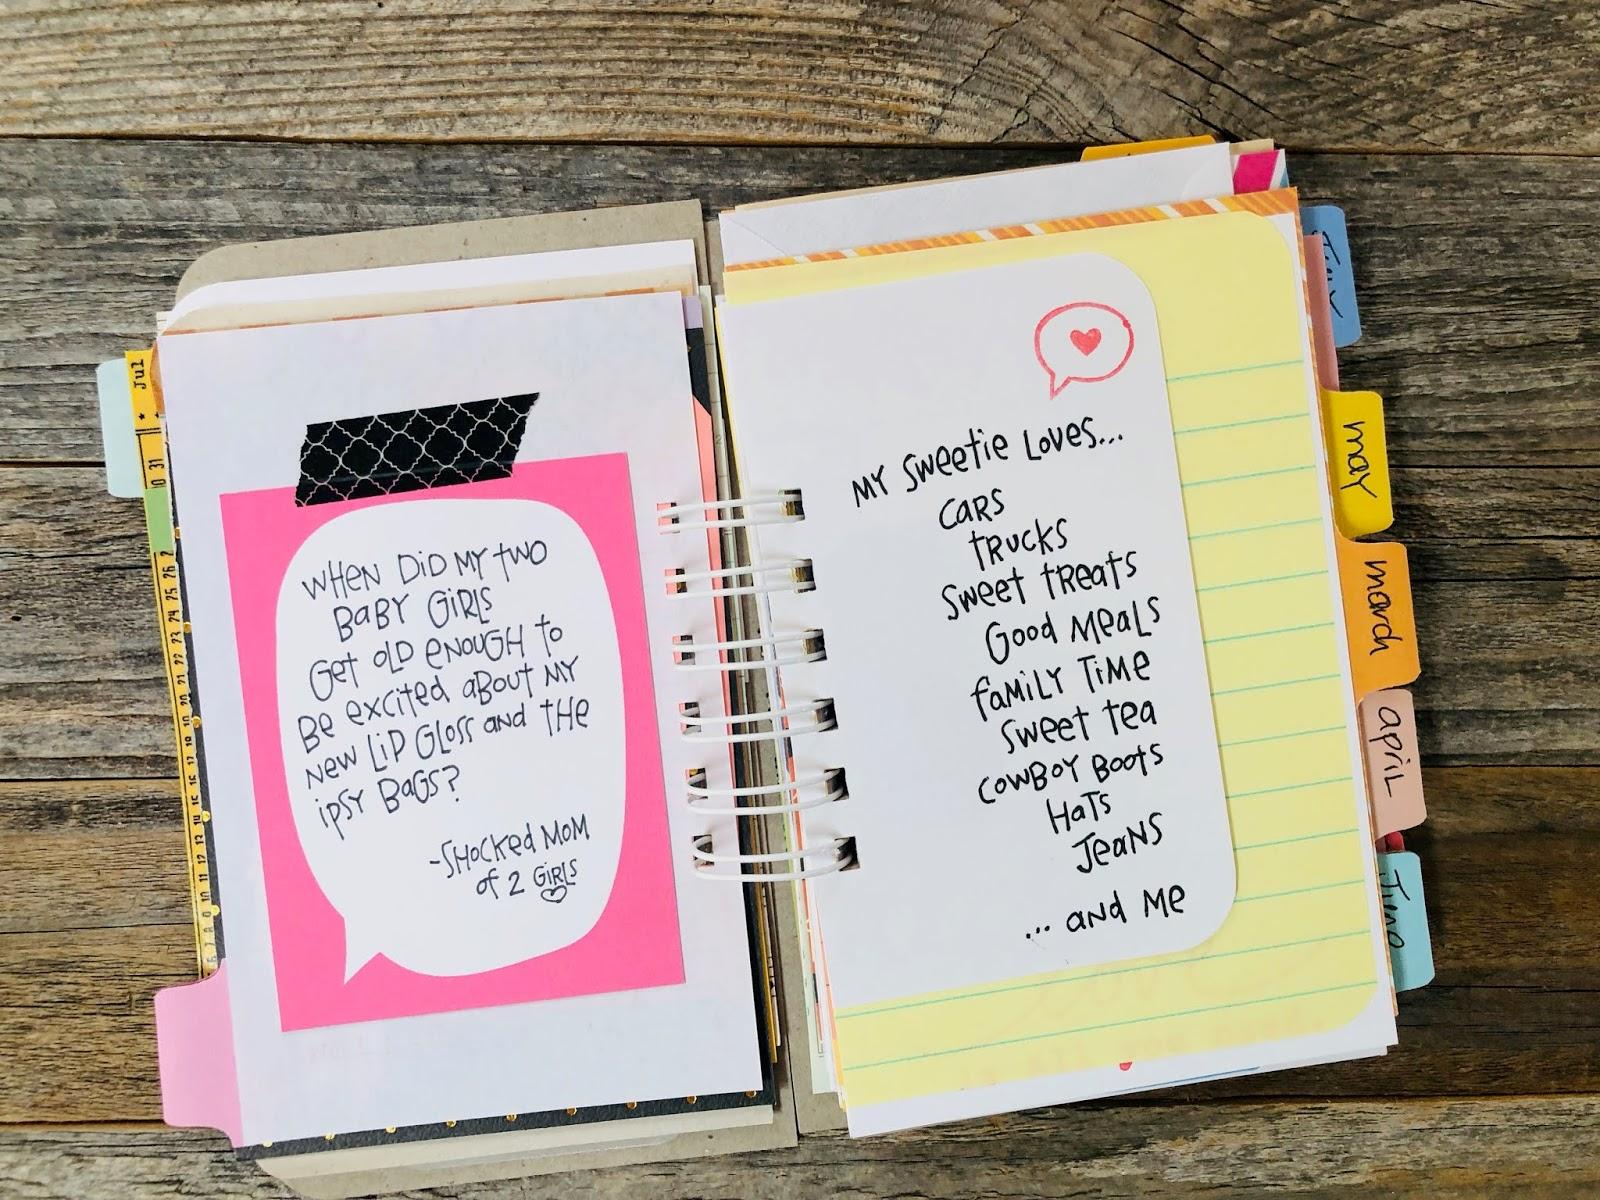 #Gratitude Journal #mindfulness #thankfulness #Things I Am Grateful For #currently #journaling cards #scrapbook #gratitude #grateful #journal